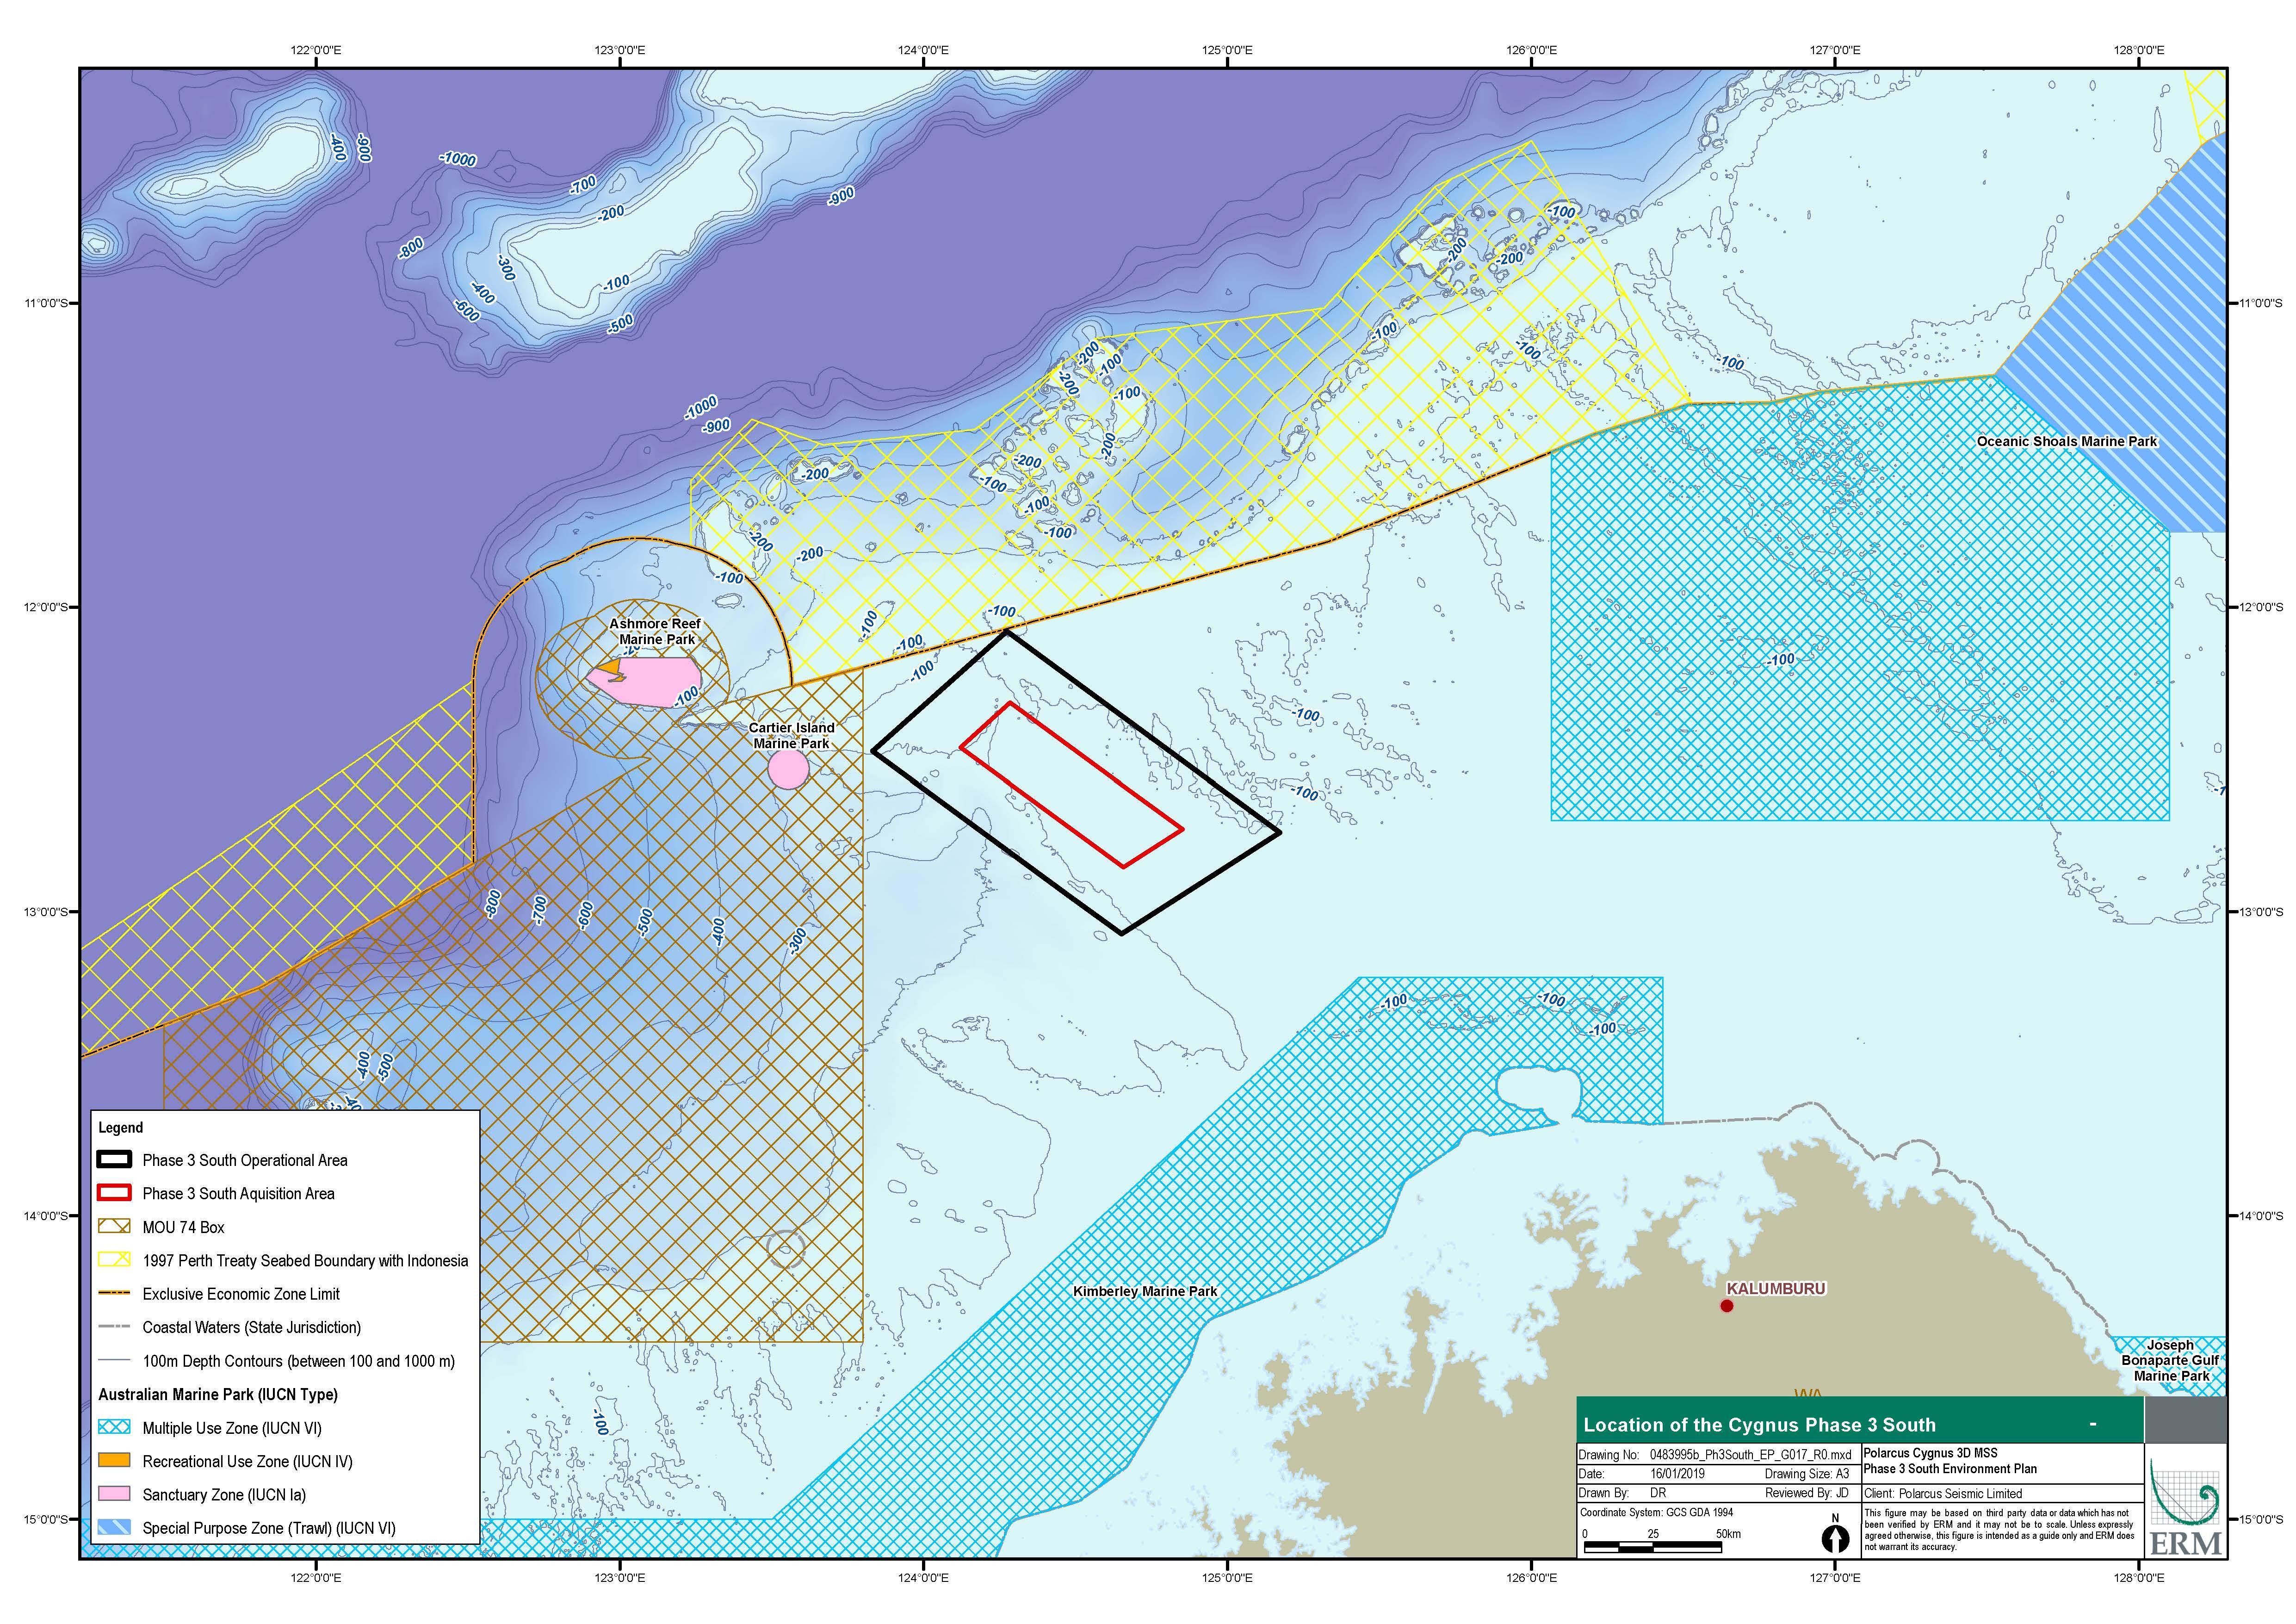 Location map - Activity: Cygnus 3D Marine Seismic Survey Phase 3 South 2019-2020 (refer to description)